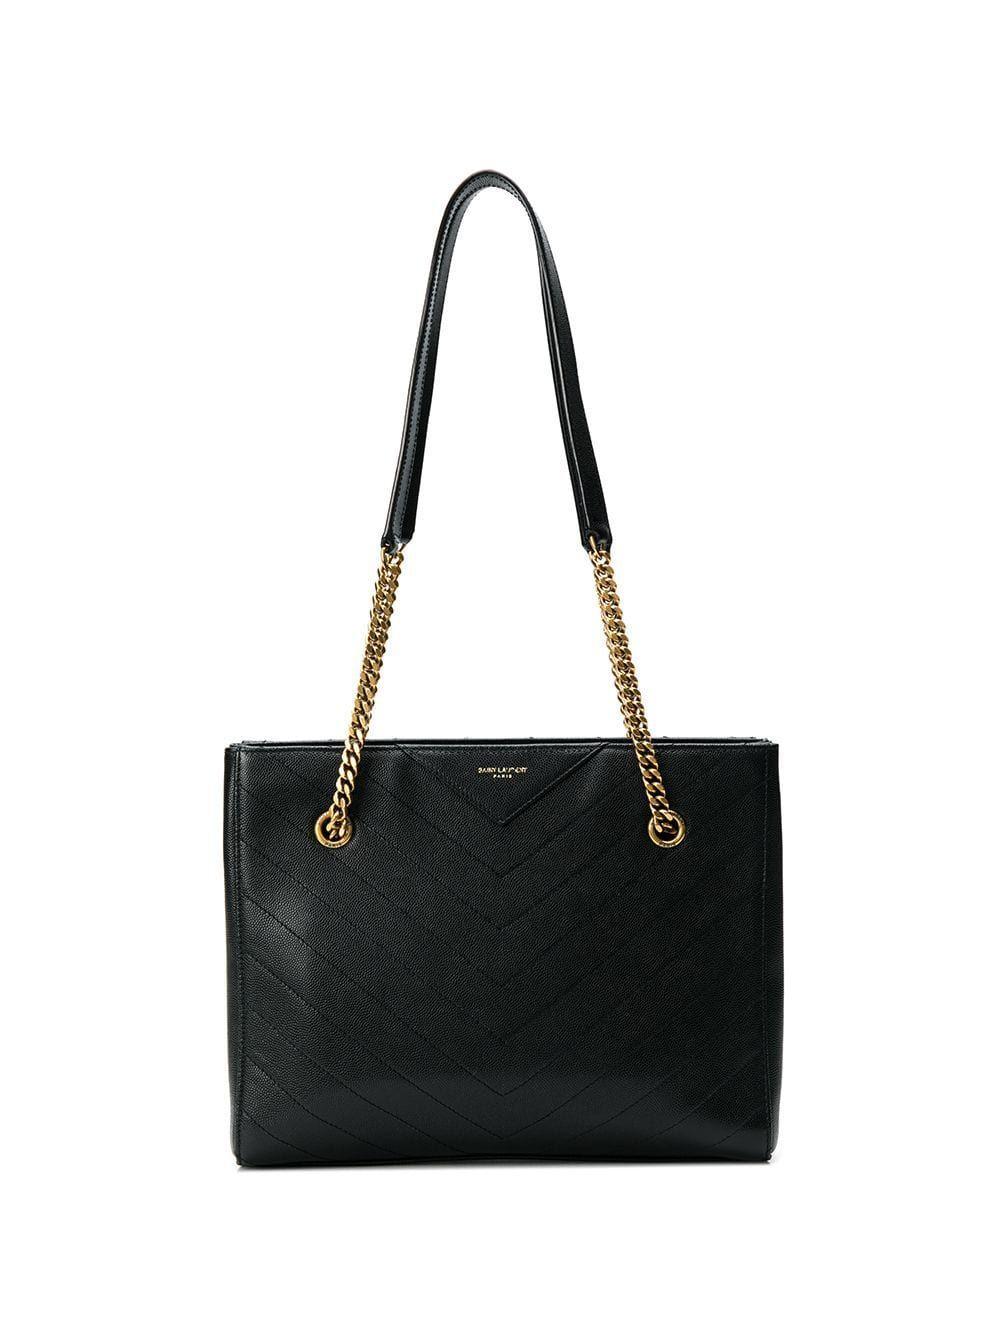 Tribeca Small Double Chain Shoulder Bag Item # 5688651CU07